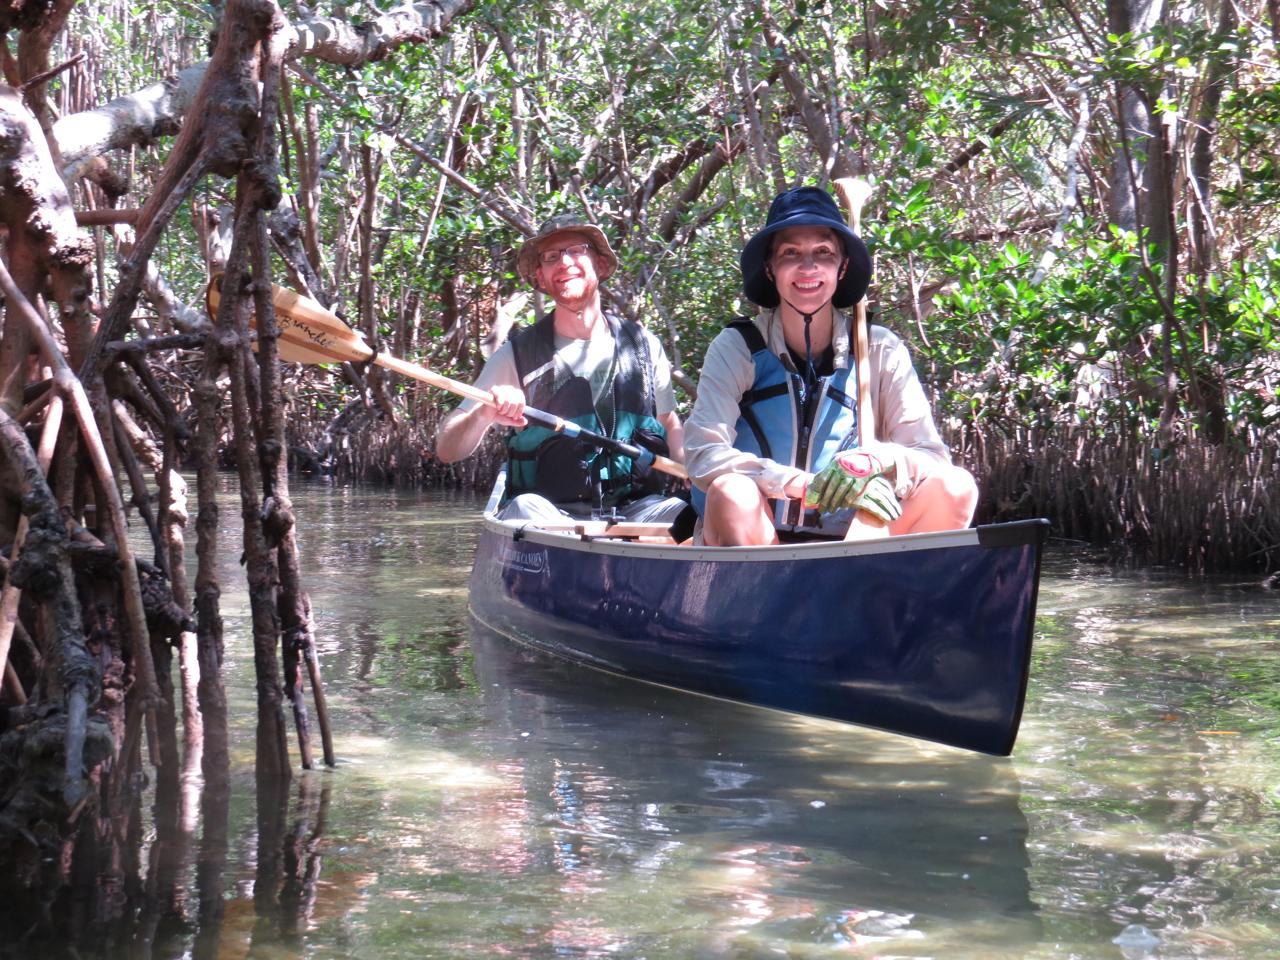 Nighthawk Canoes - Light, Strong, Beautiful Custom-Built